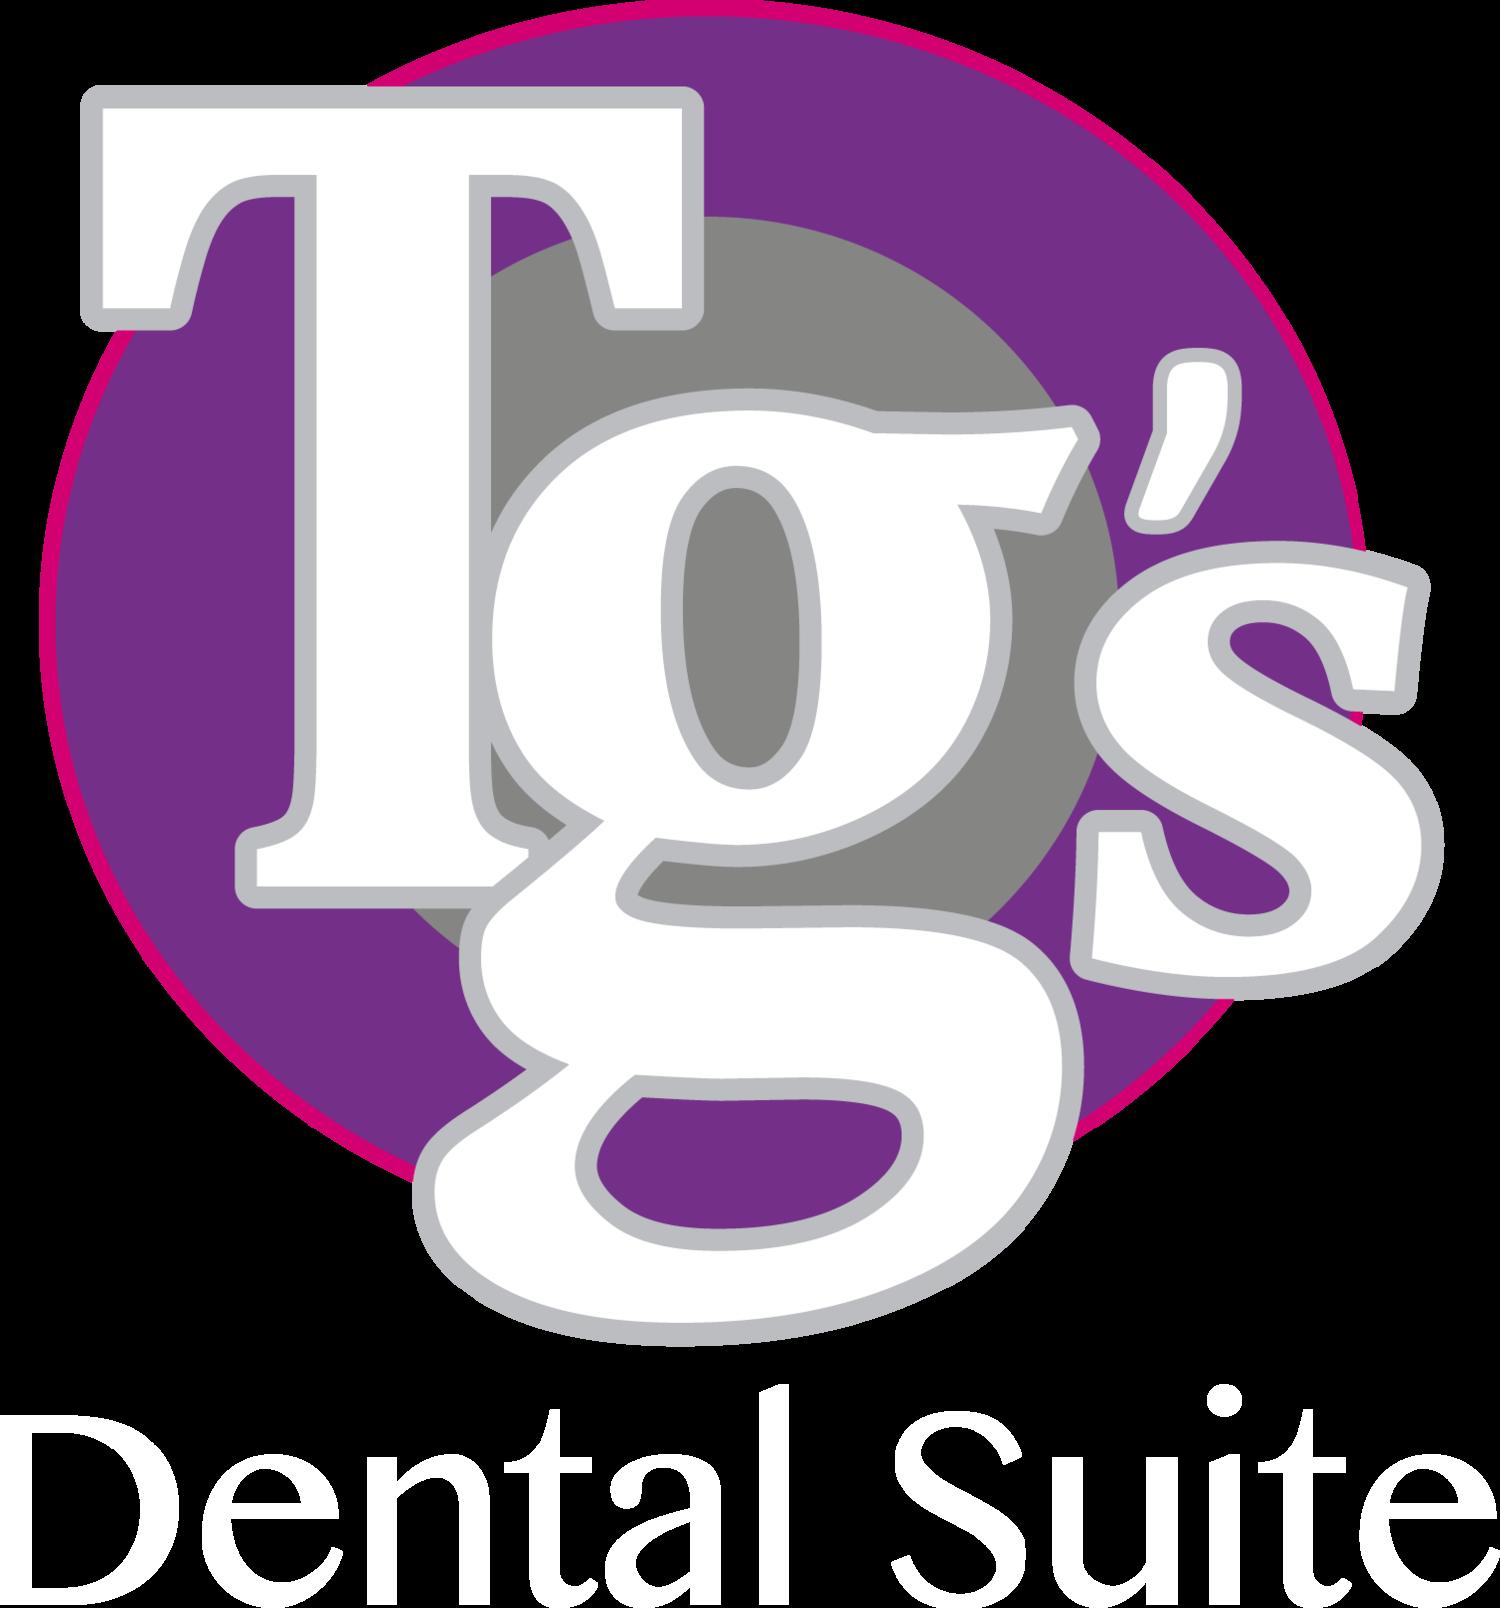 Dental clipart dental screening. Services tg s suite